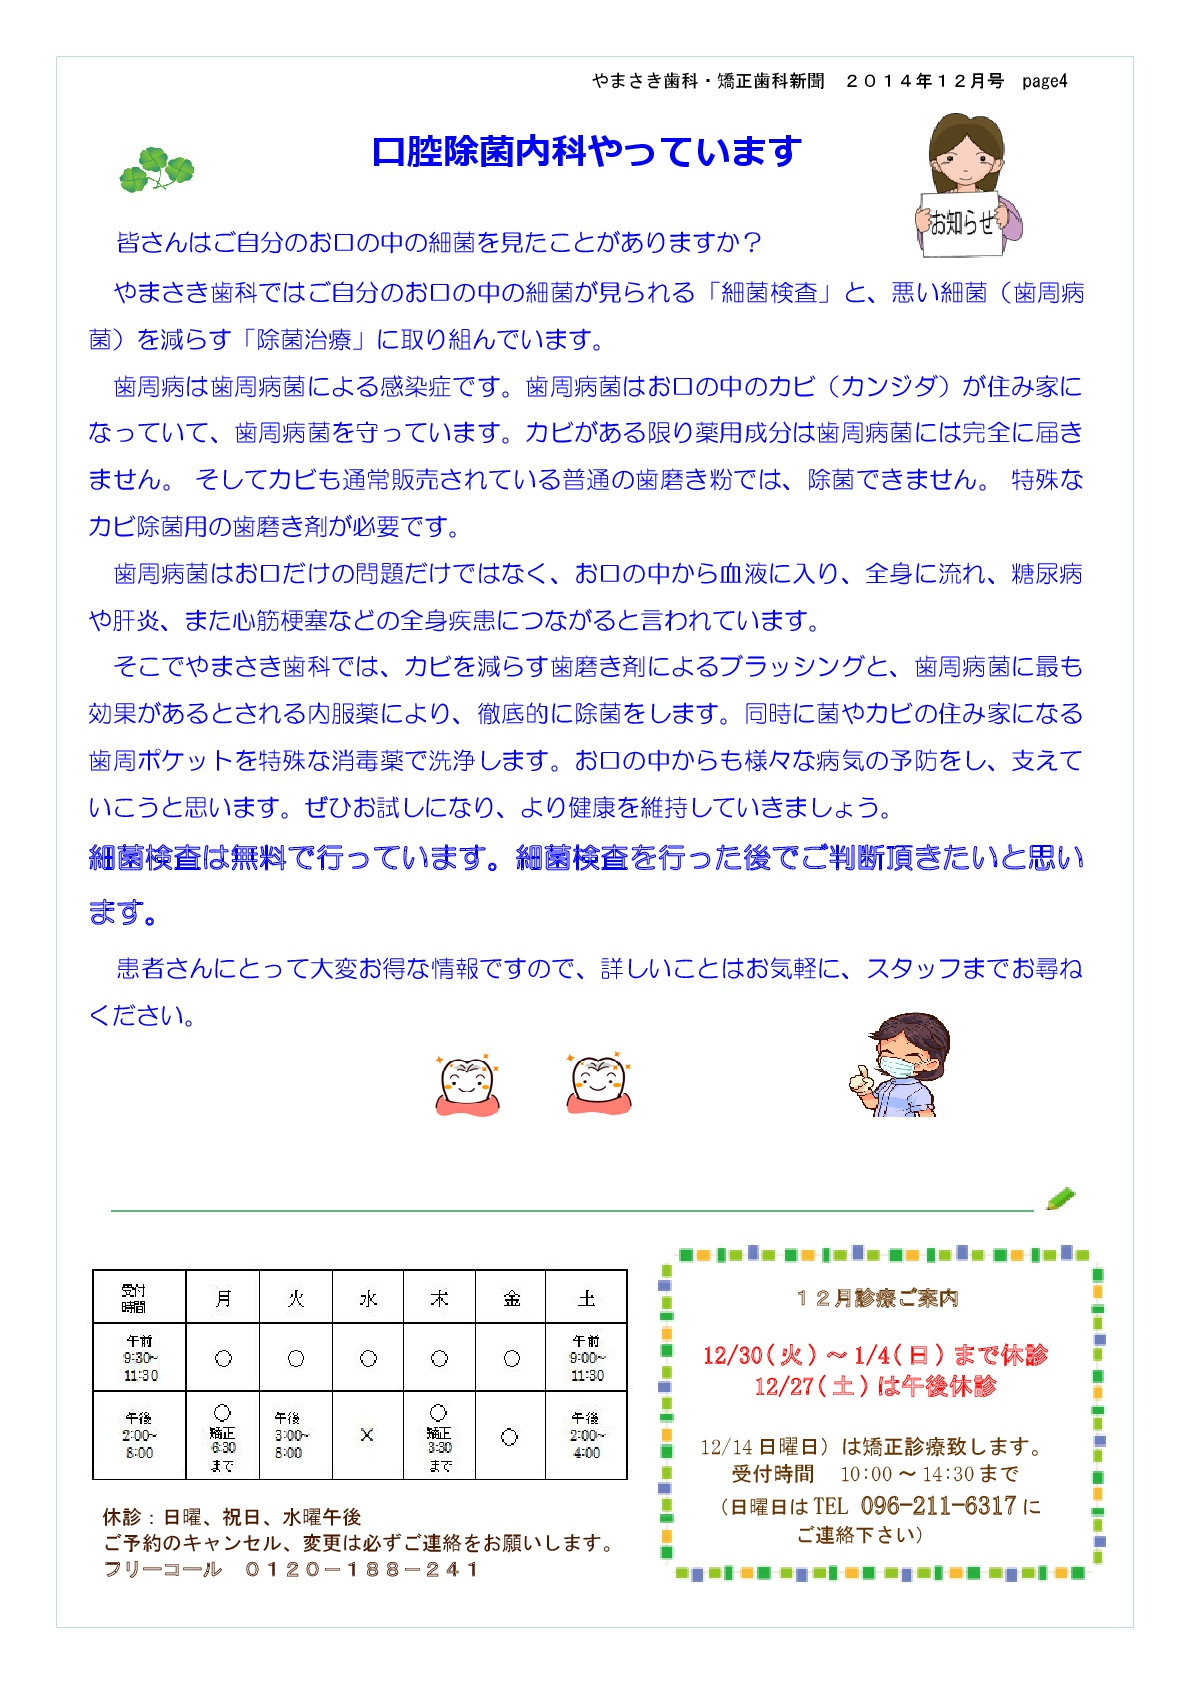 sinbun14-12-2-003